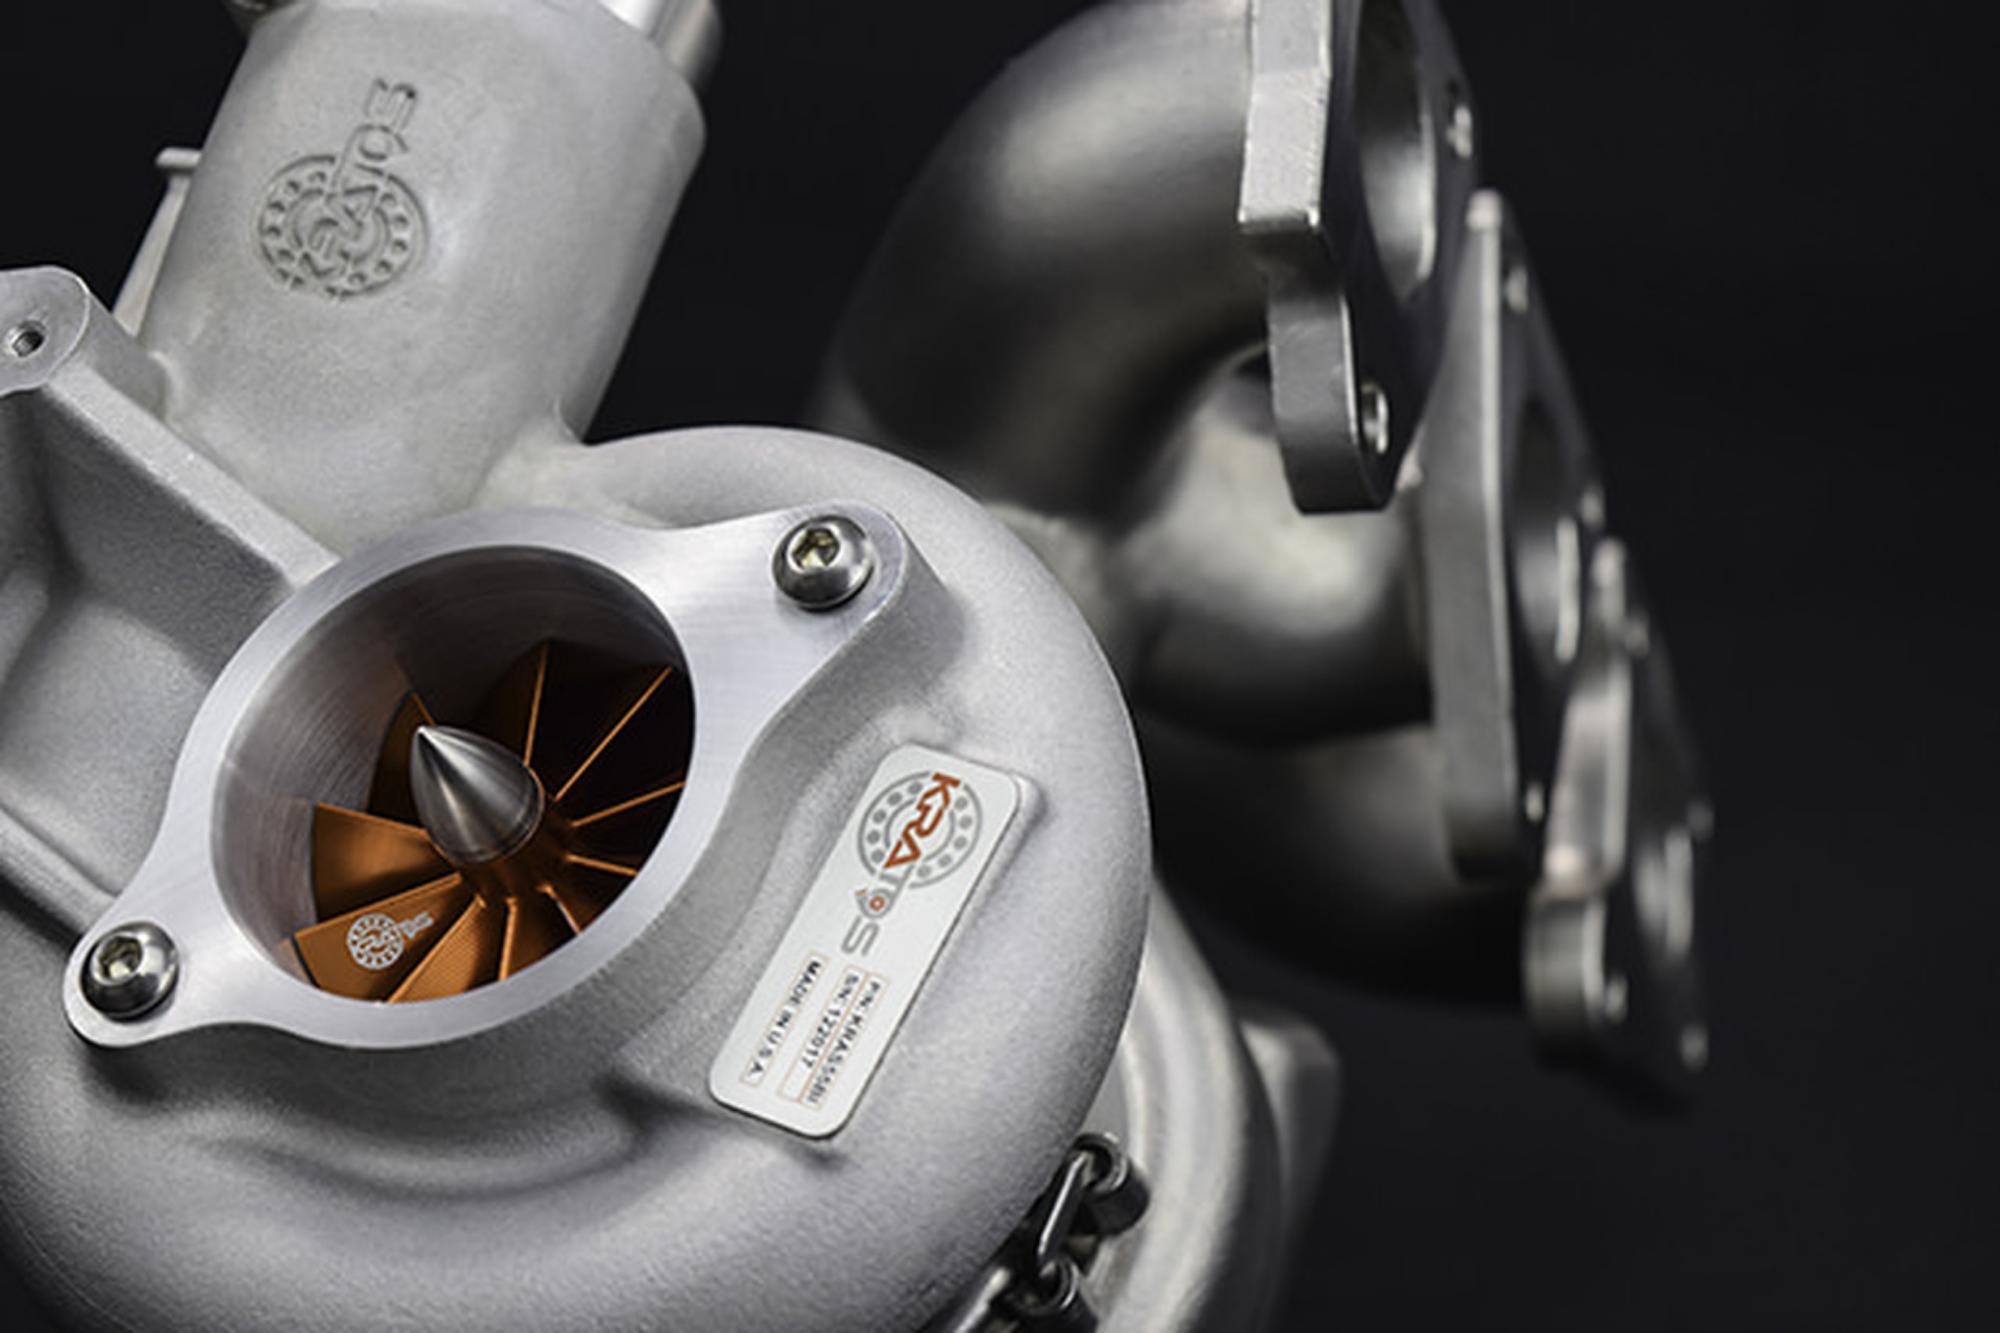 S55 Kratos Upgraded Twin Turbos